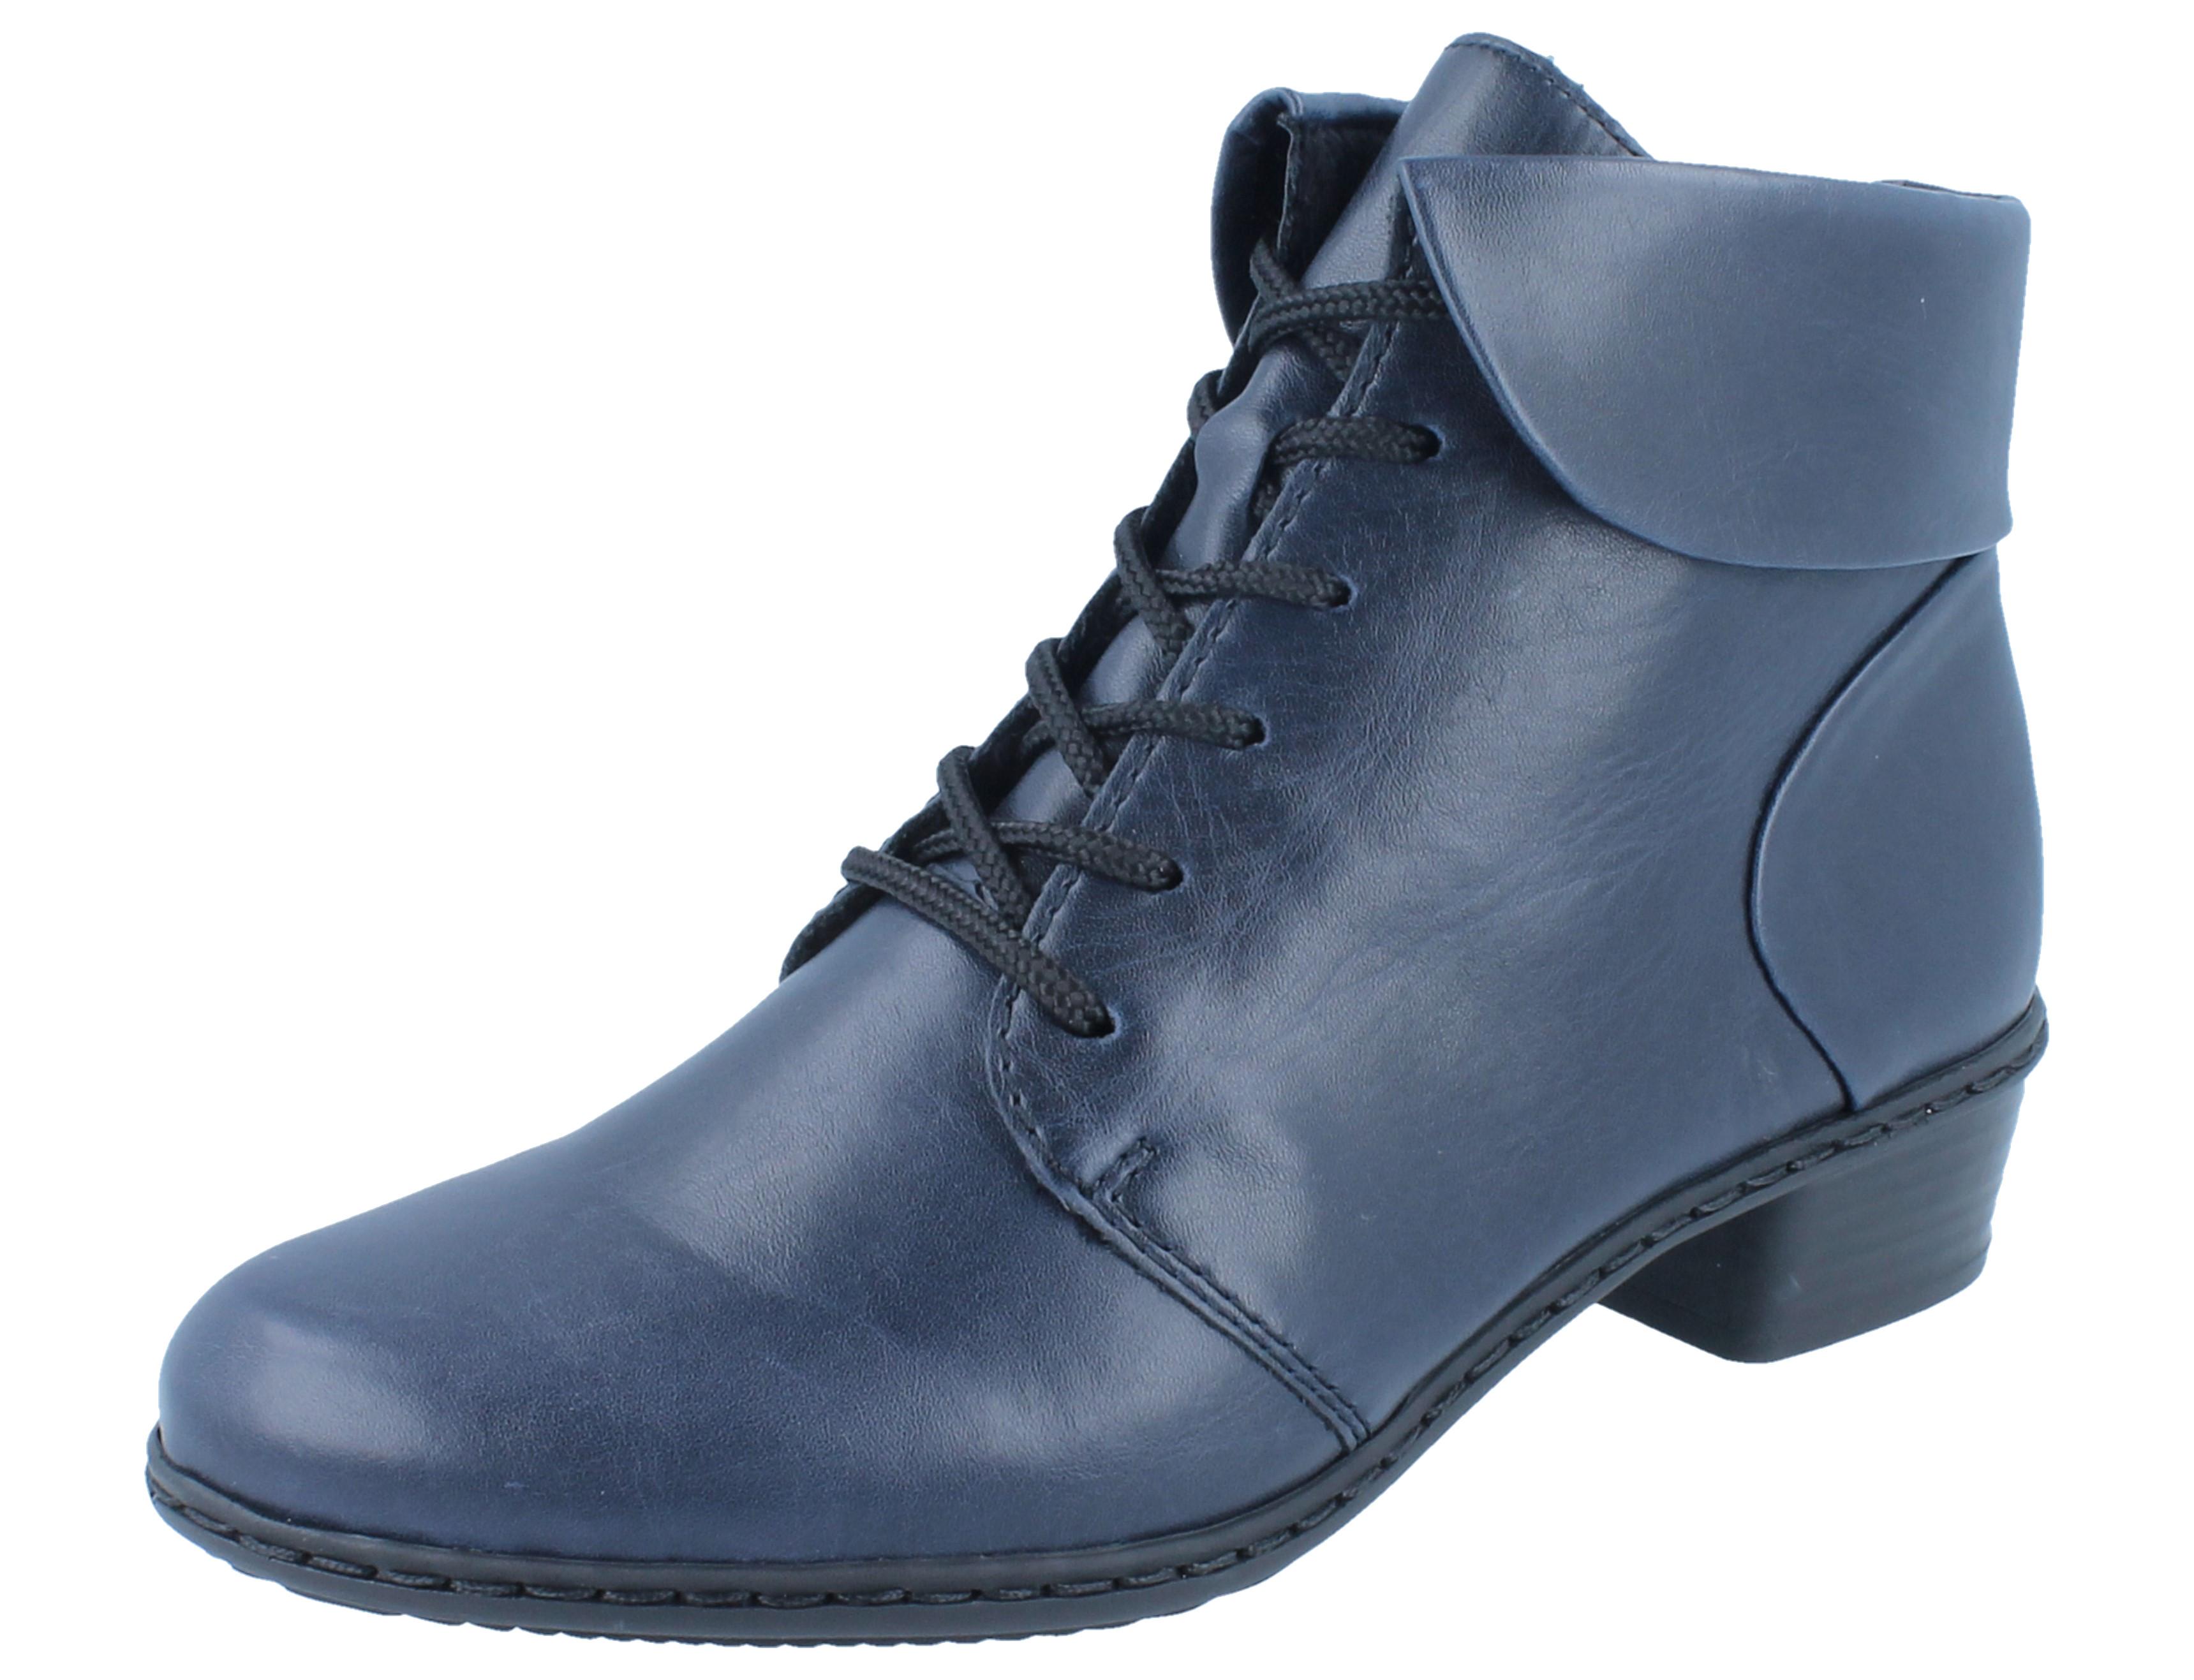 RIEKER Y0711 14 Stiefelette blau